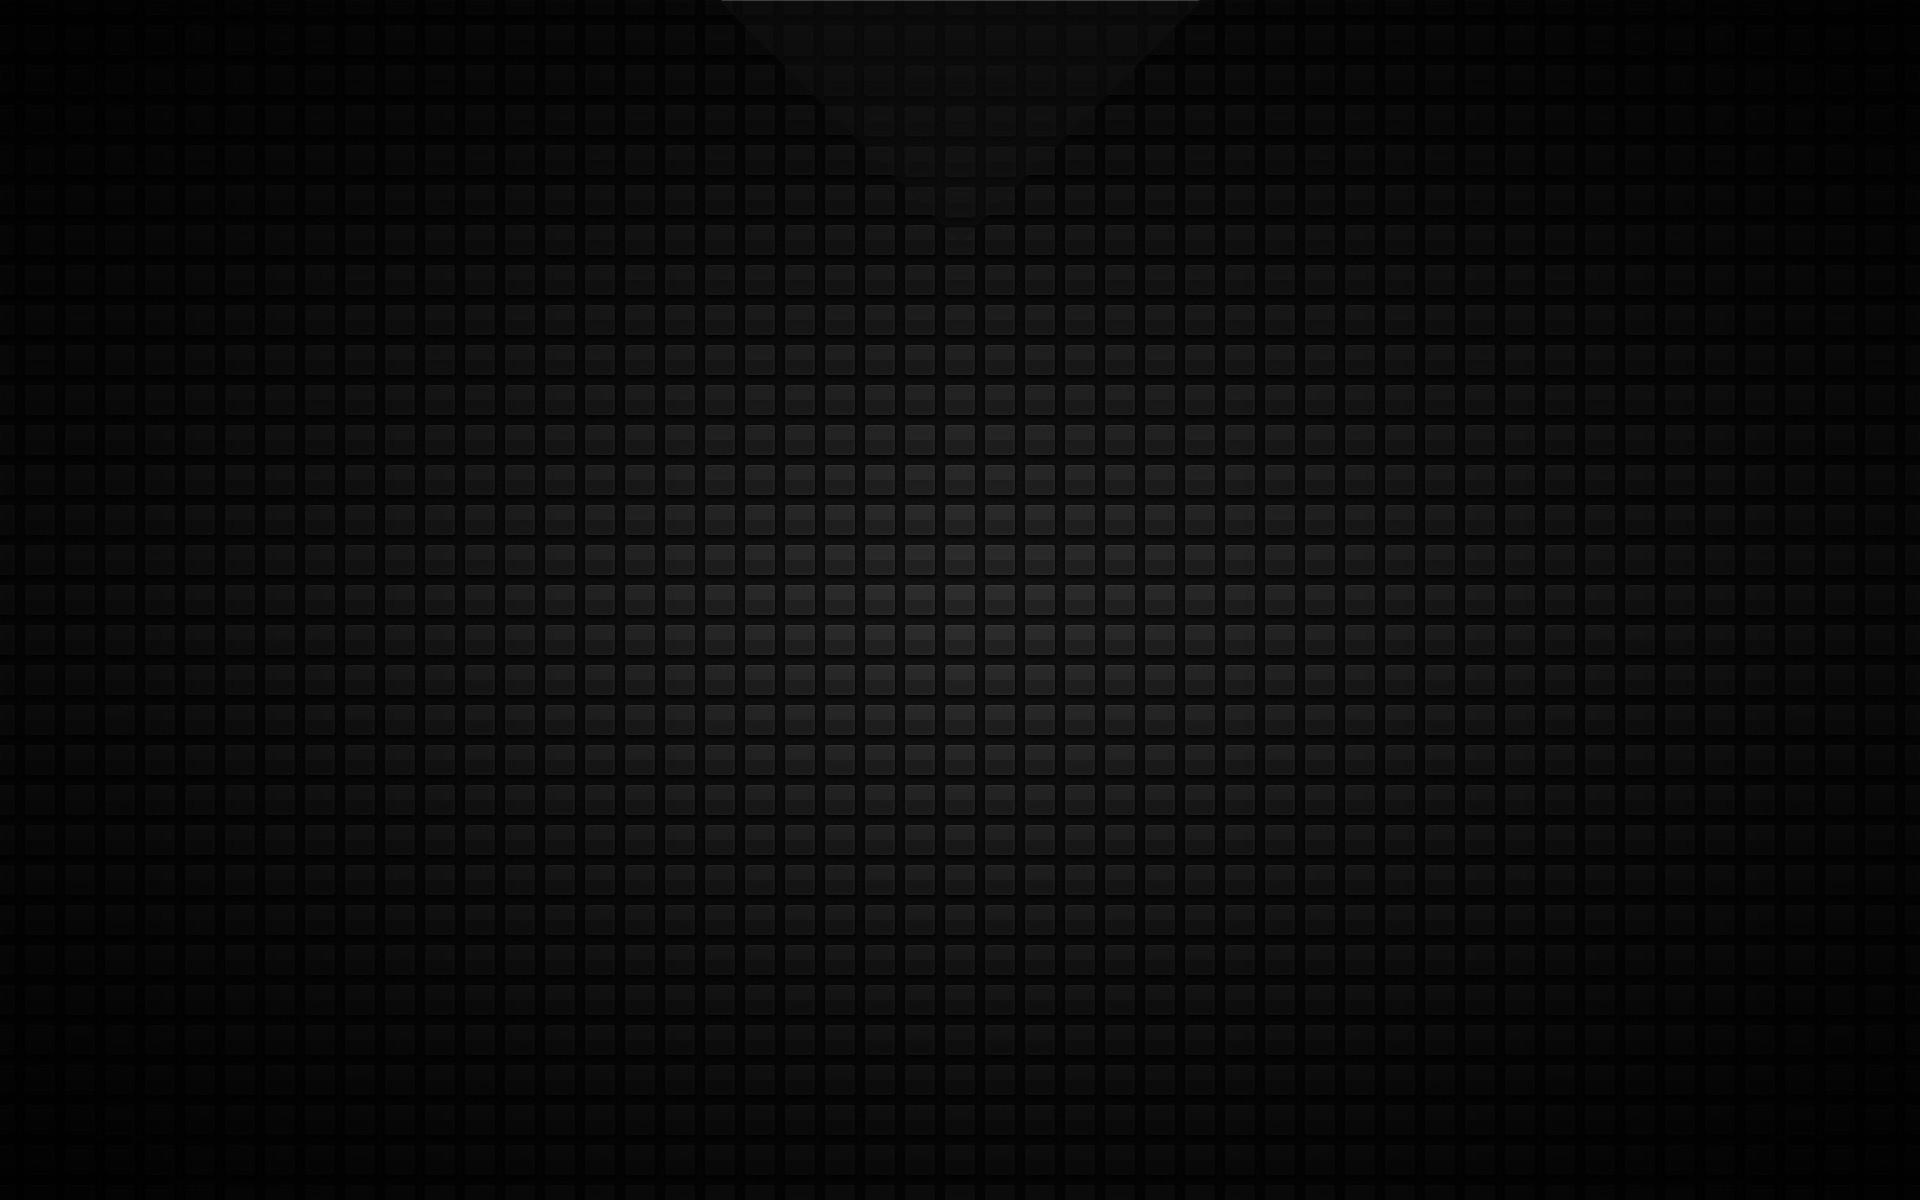 Black Wallpaper Download Full Hd : HD Black wallpaper ·① Download free amazing full HD ...